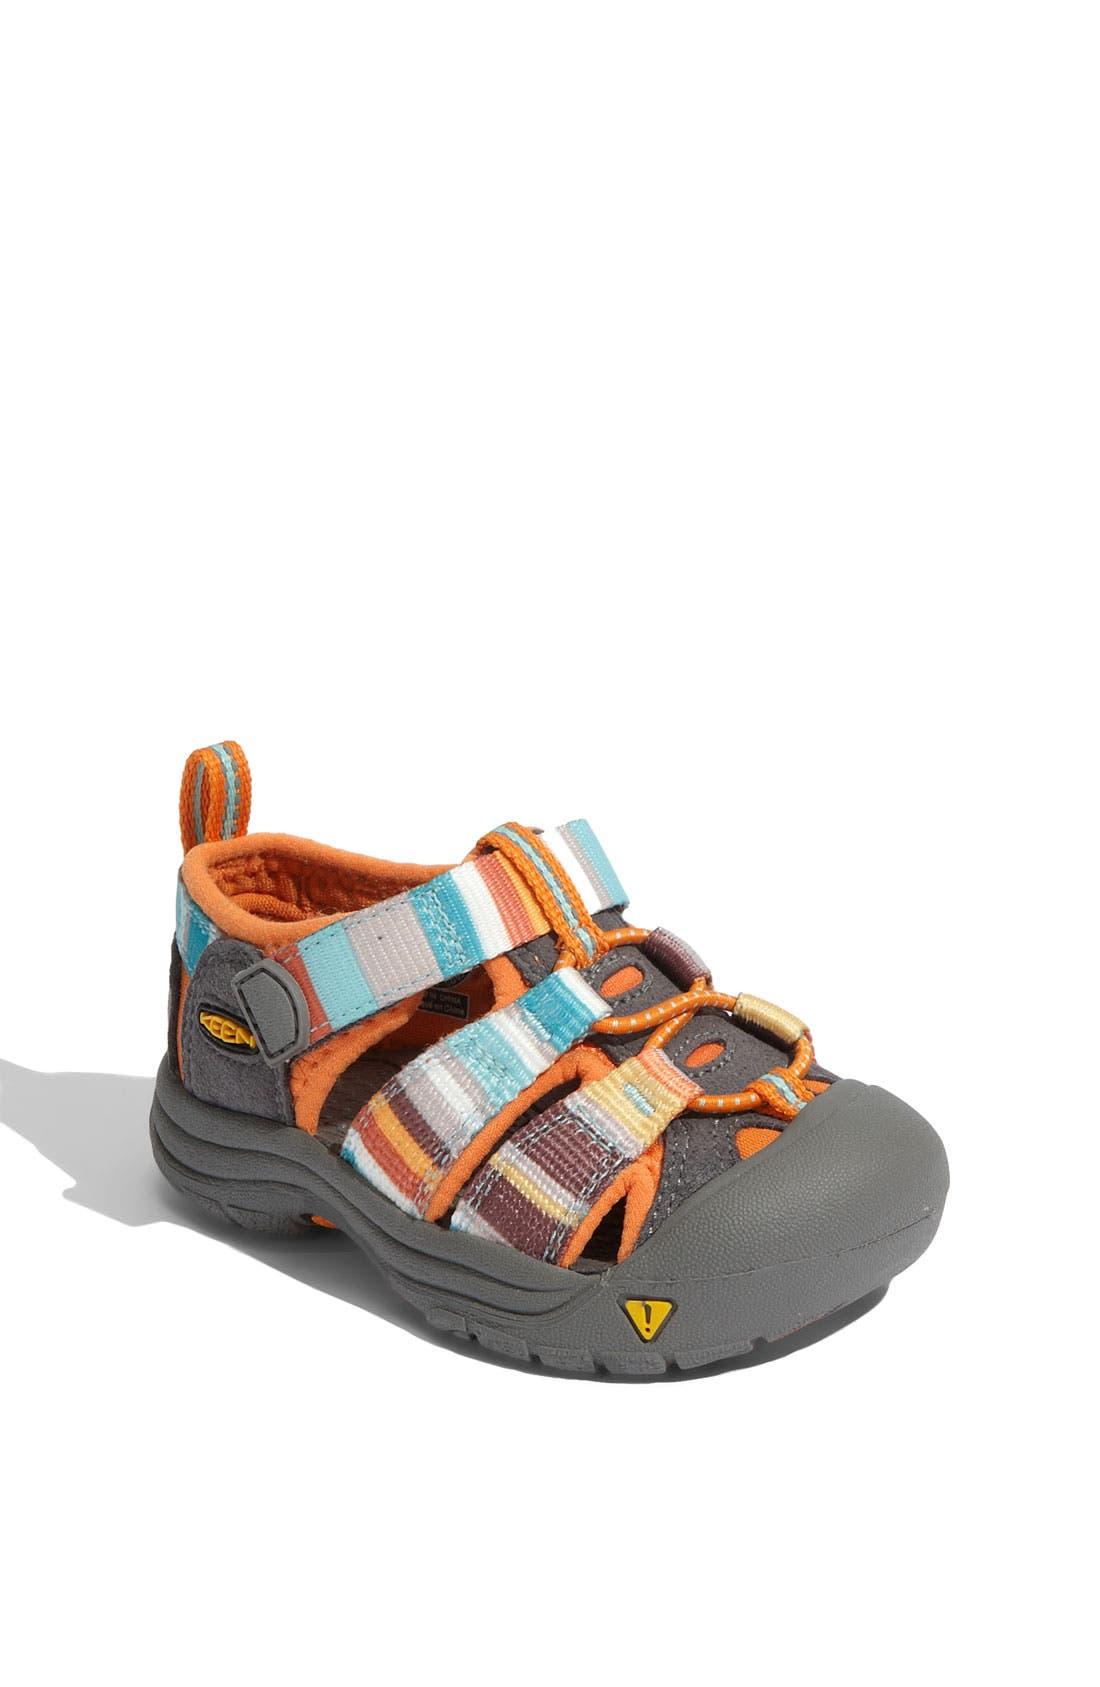 Main Image - Keen 'Newport H2' Sandal (Baby & Walker)